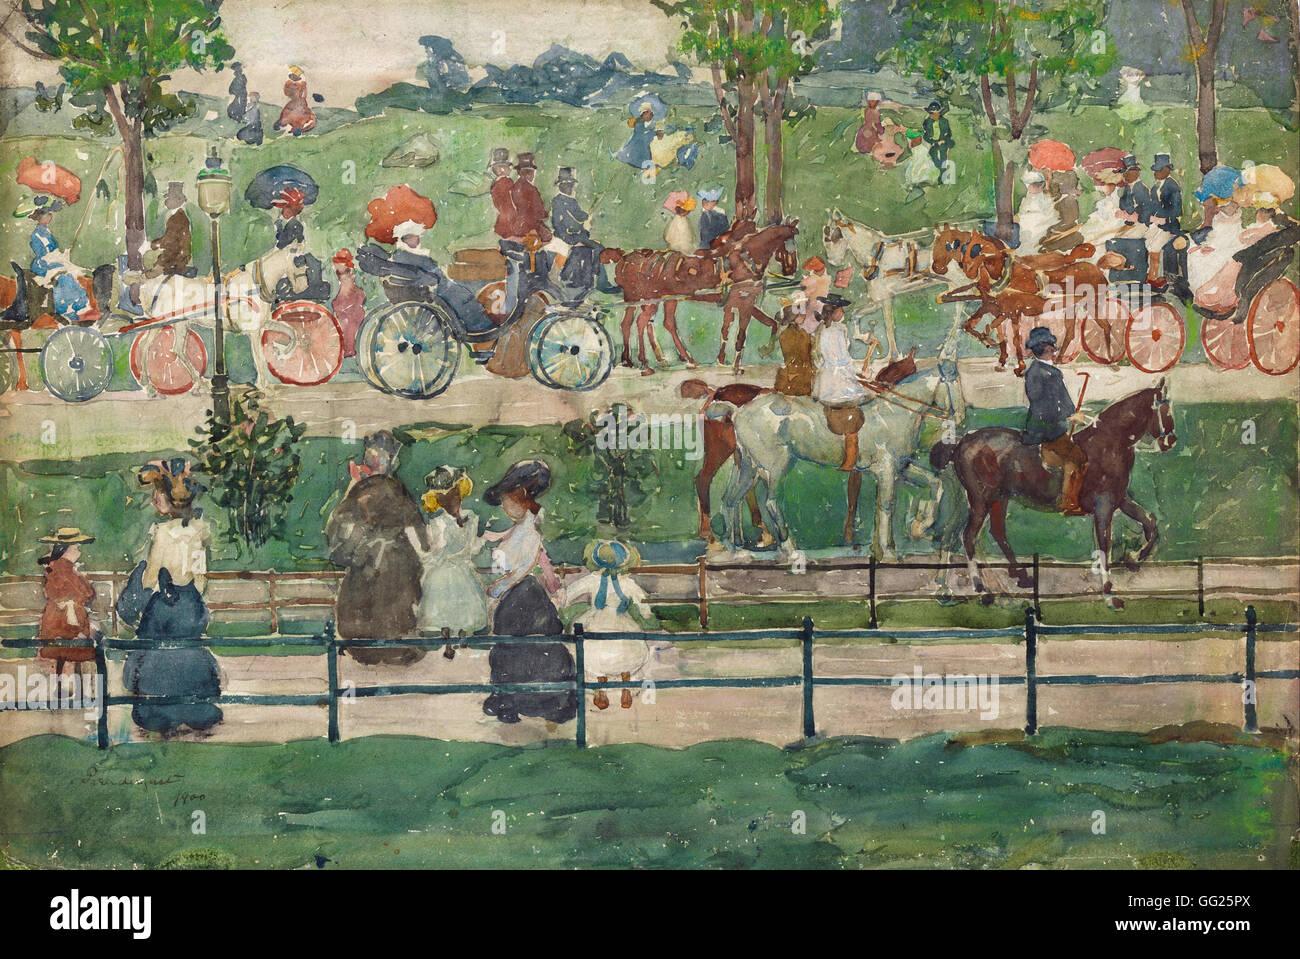 Maurice Prendergast - Central Park, 1900 - Stock Image